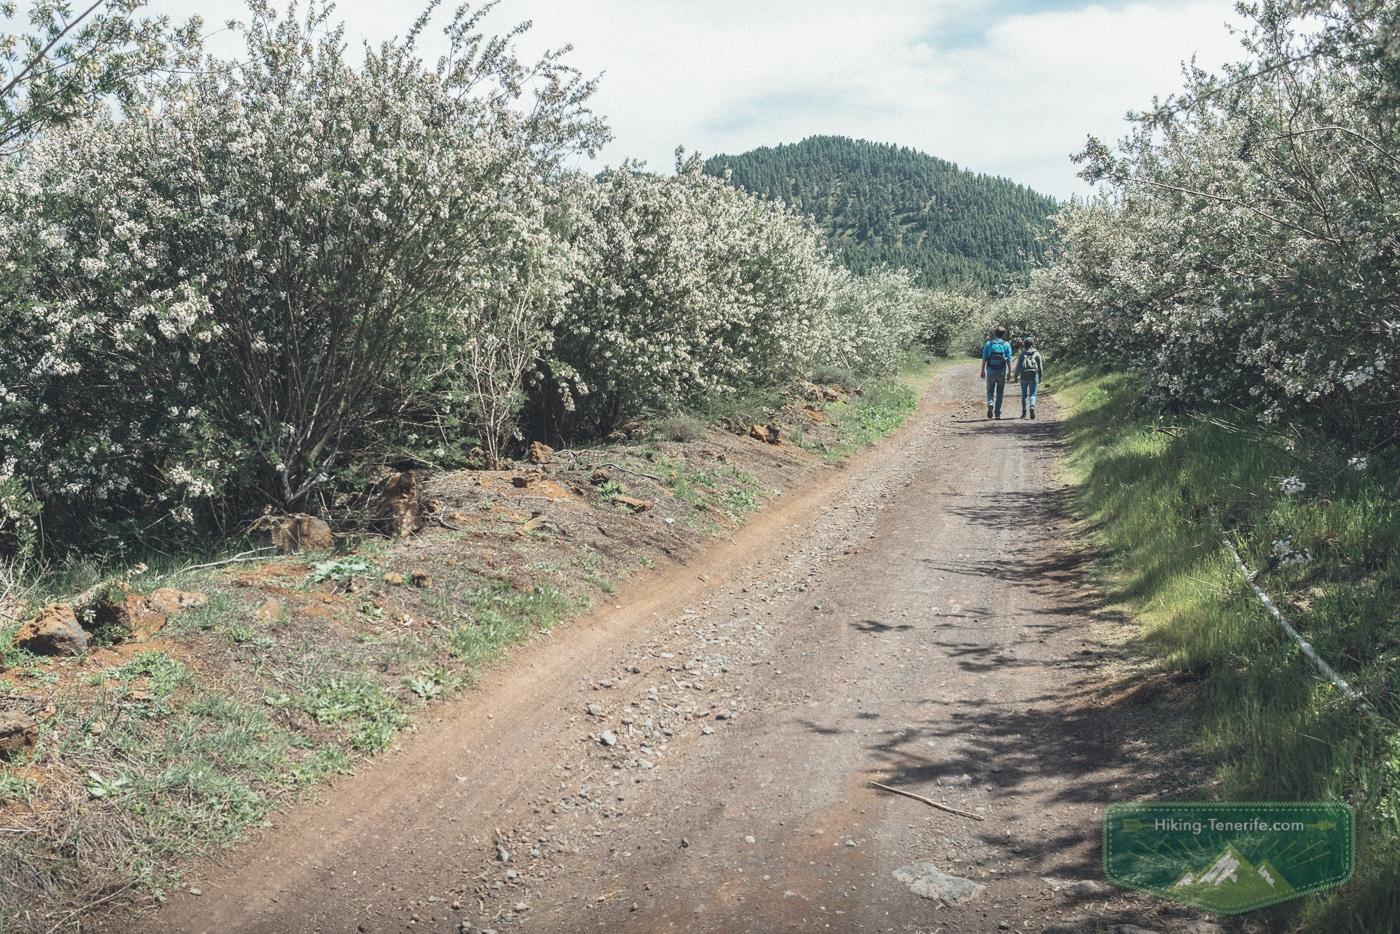 поход по тенерифе весной